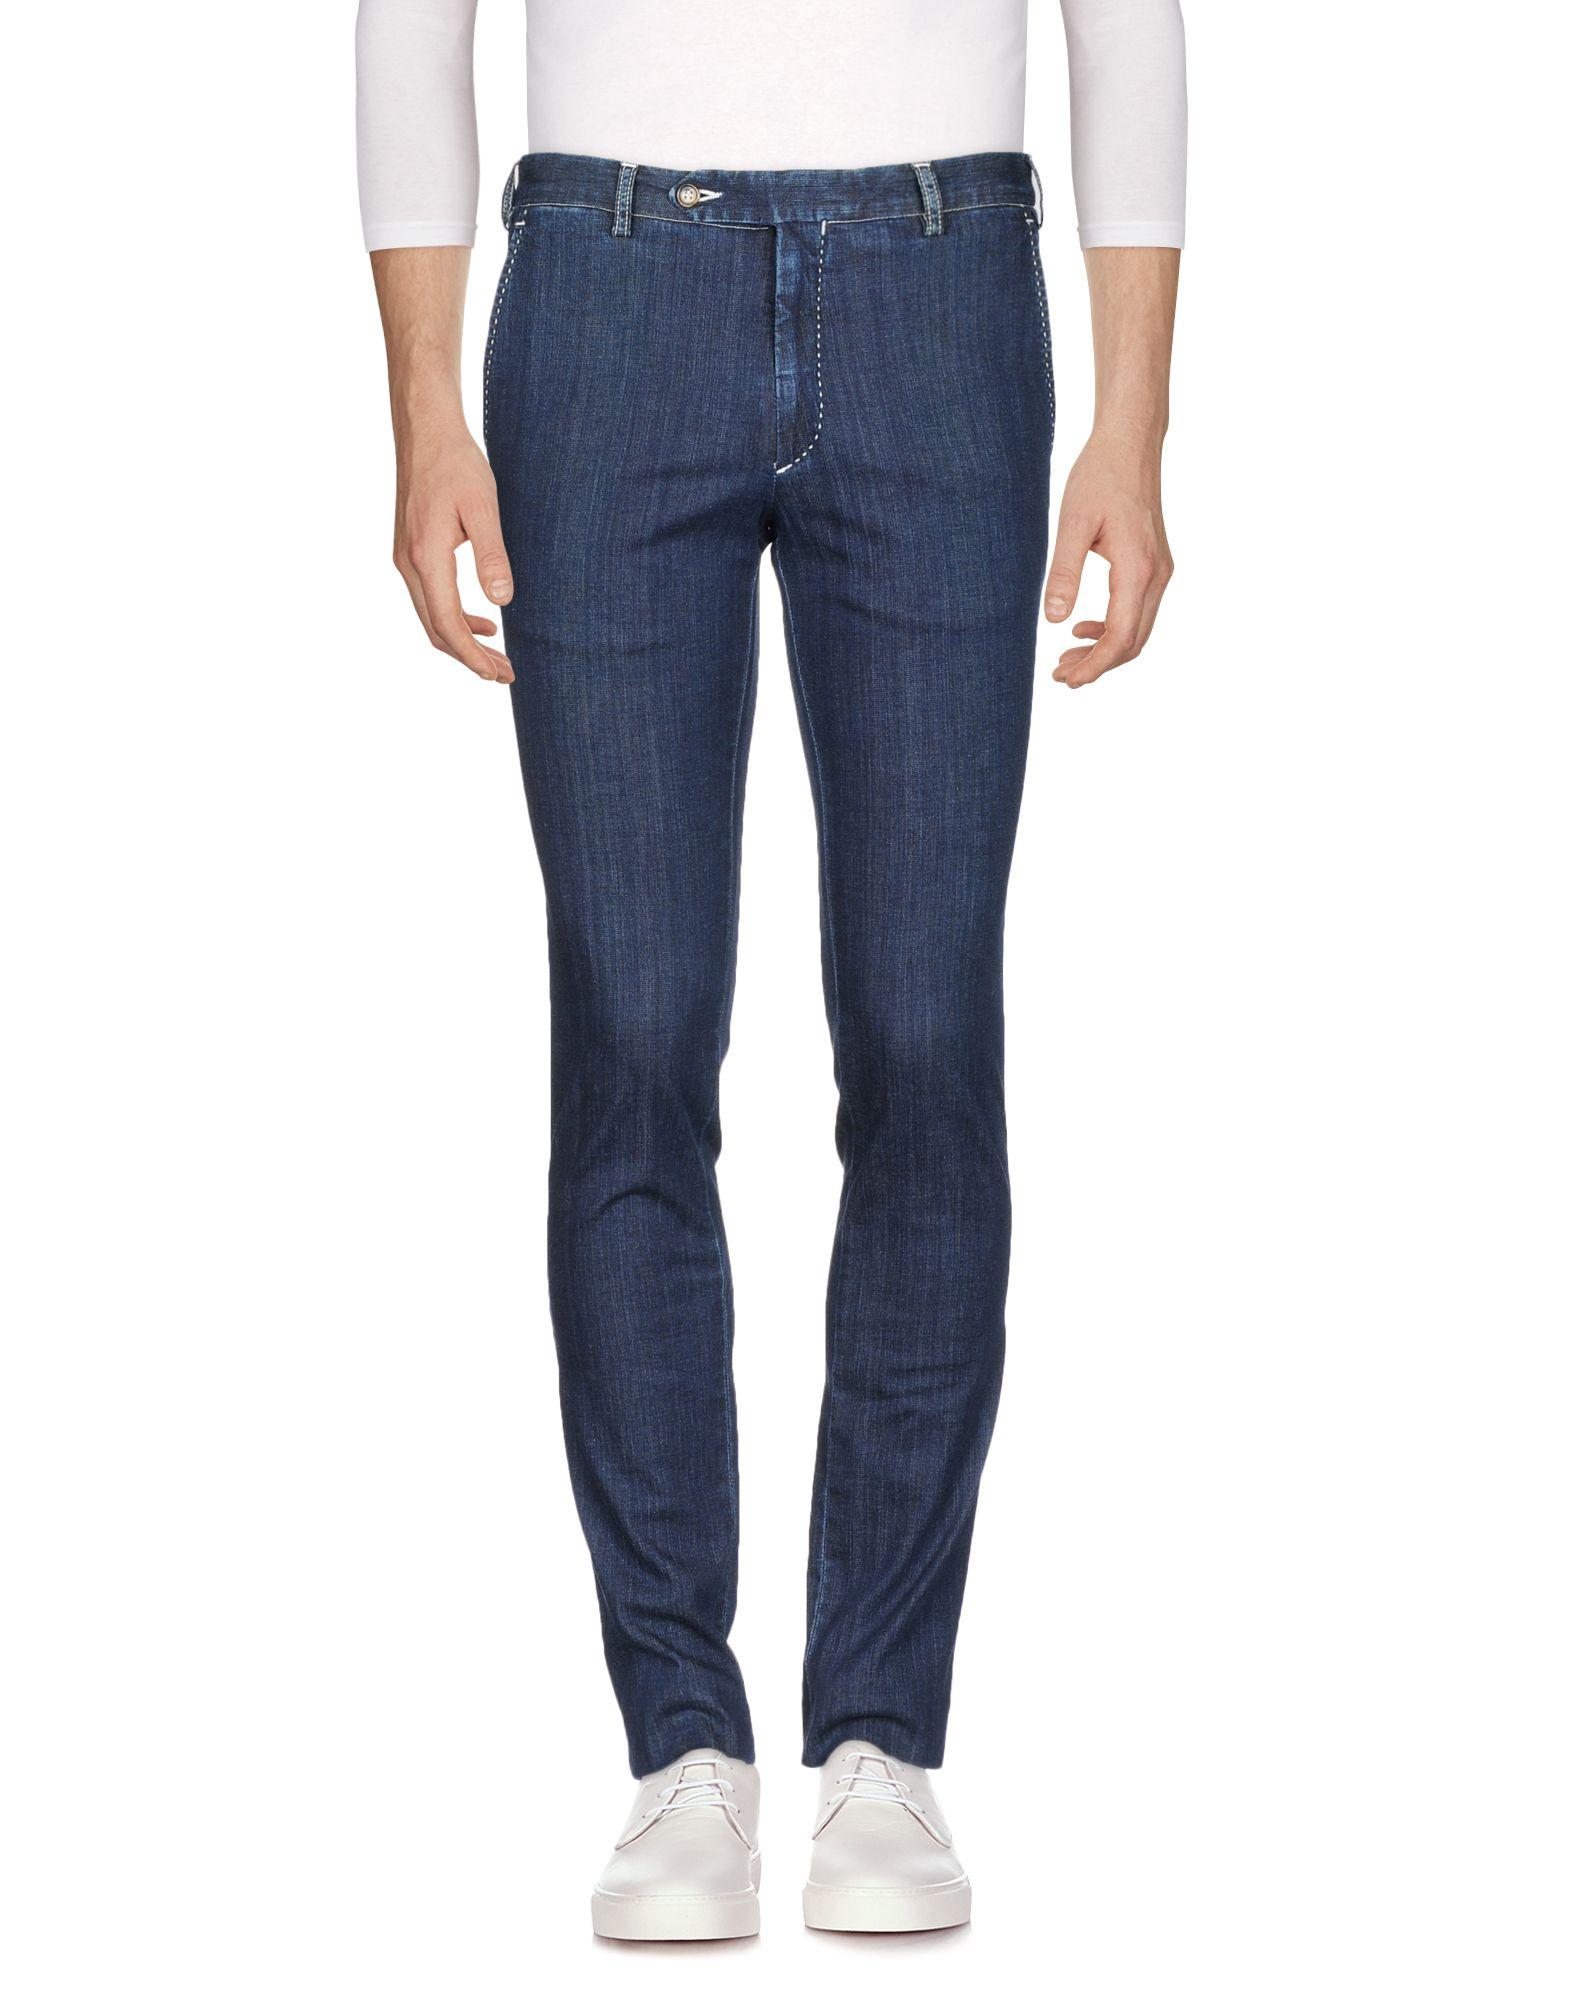 Pantaloni Jeans Rotasport Uomo - Acquista online su